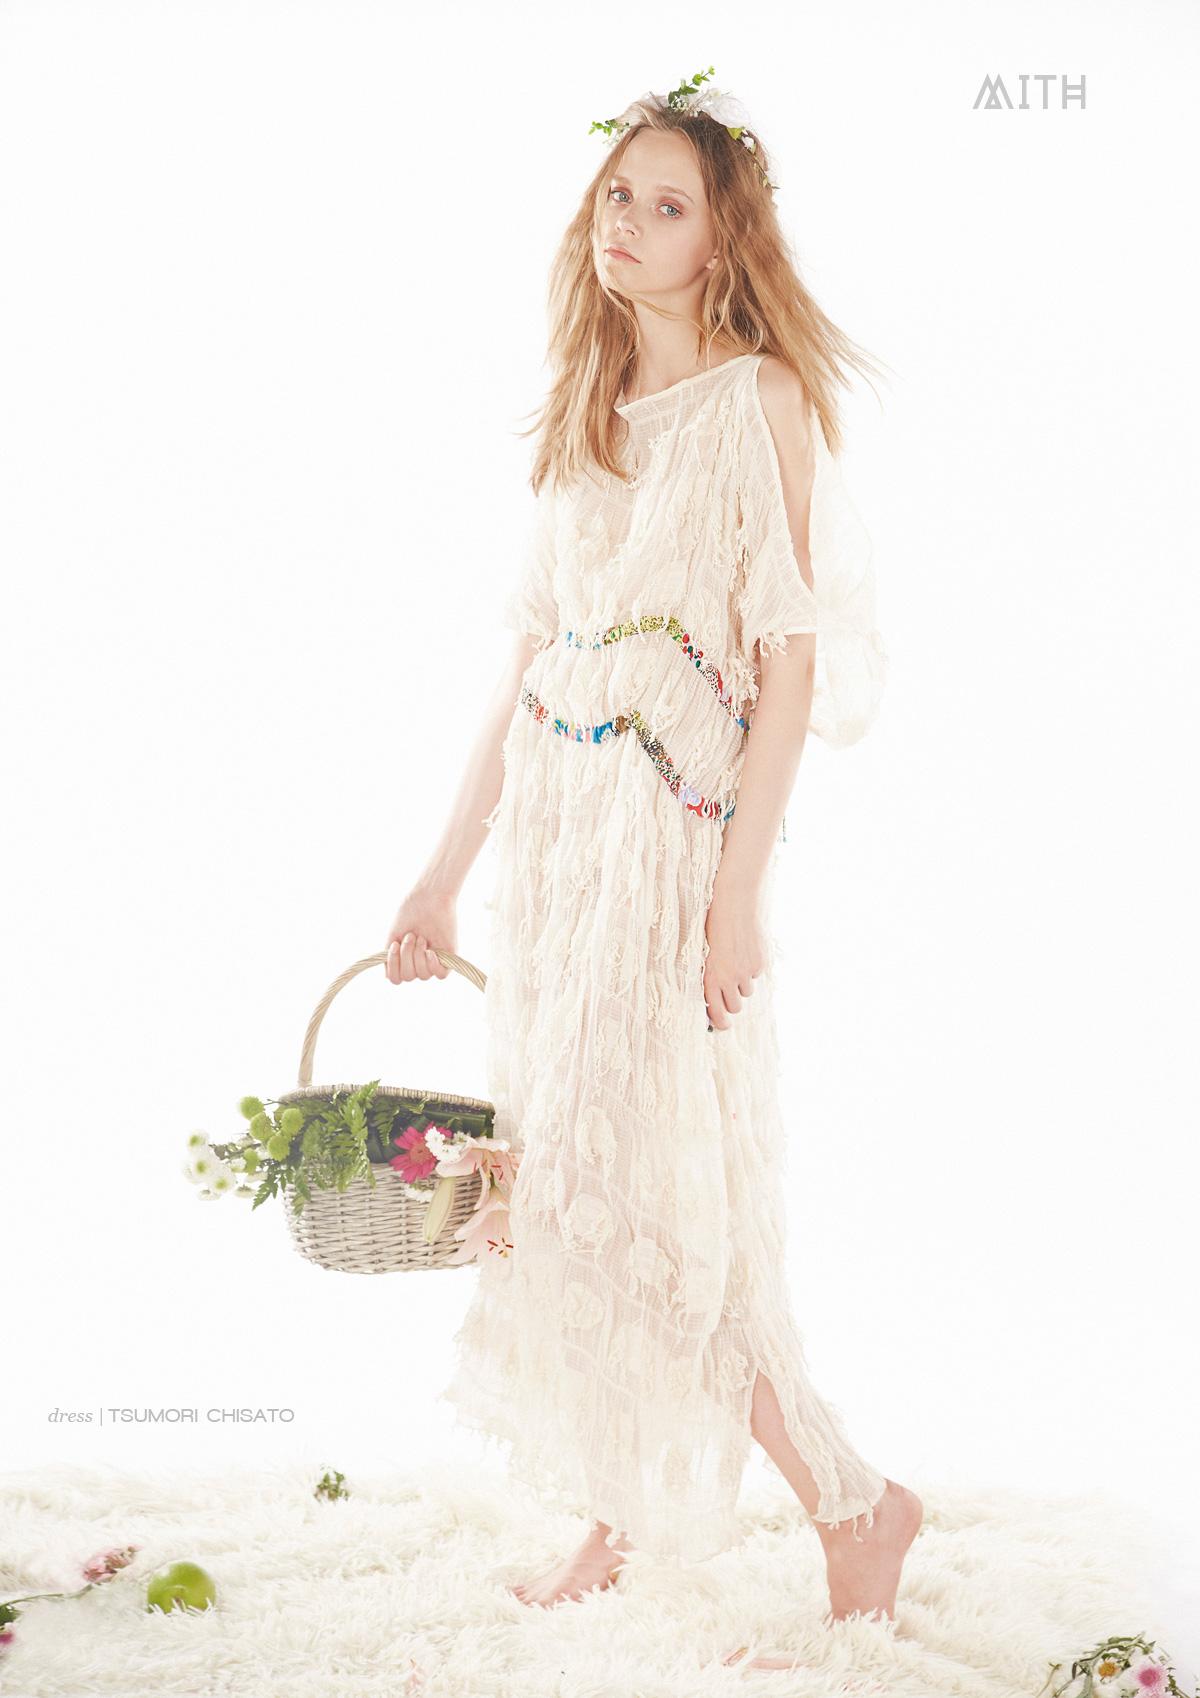 Dress: Tsumori Chisato